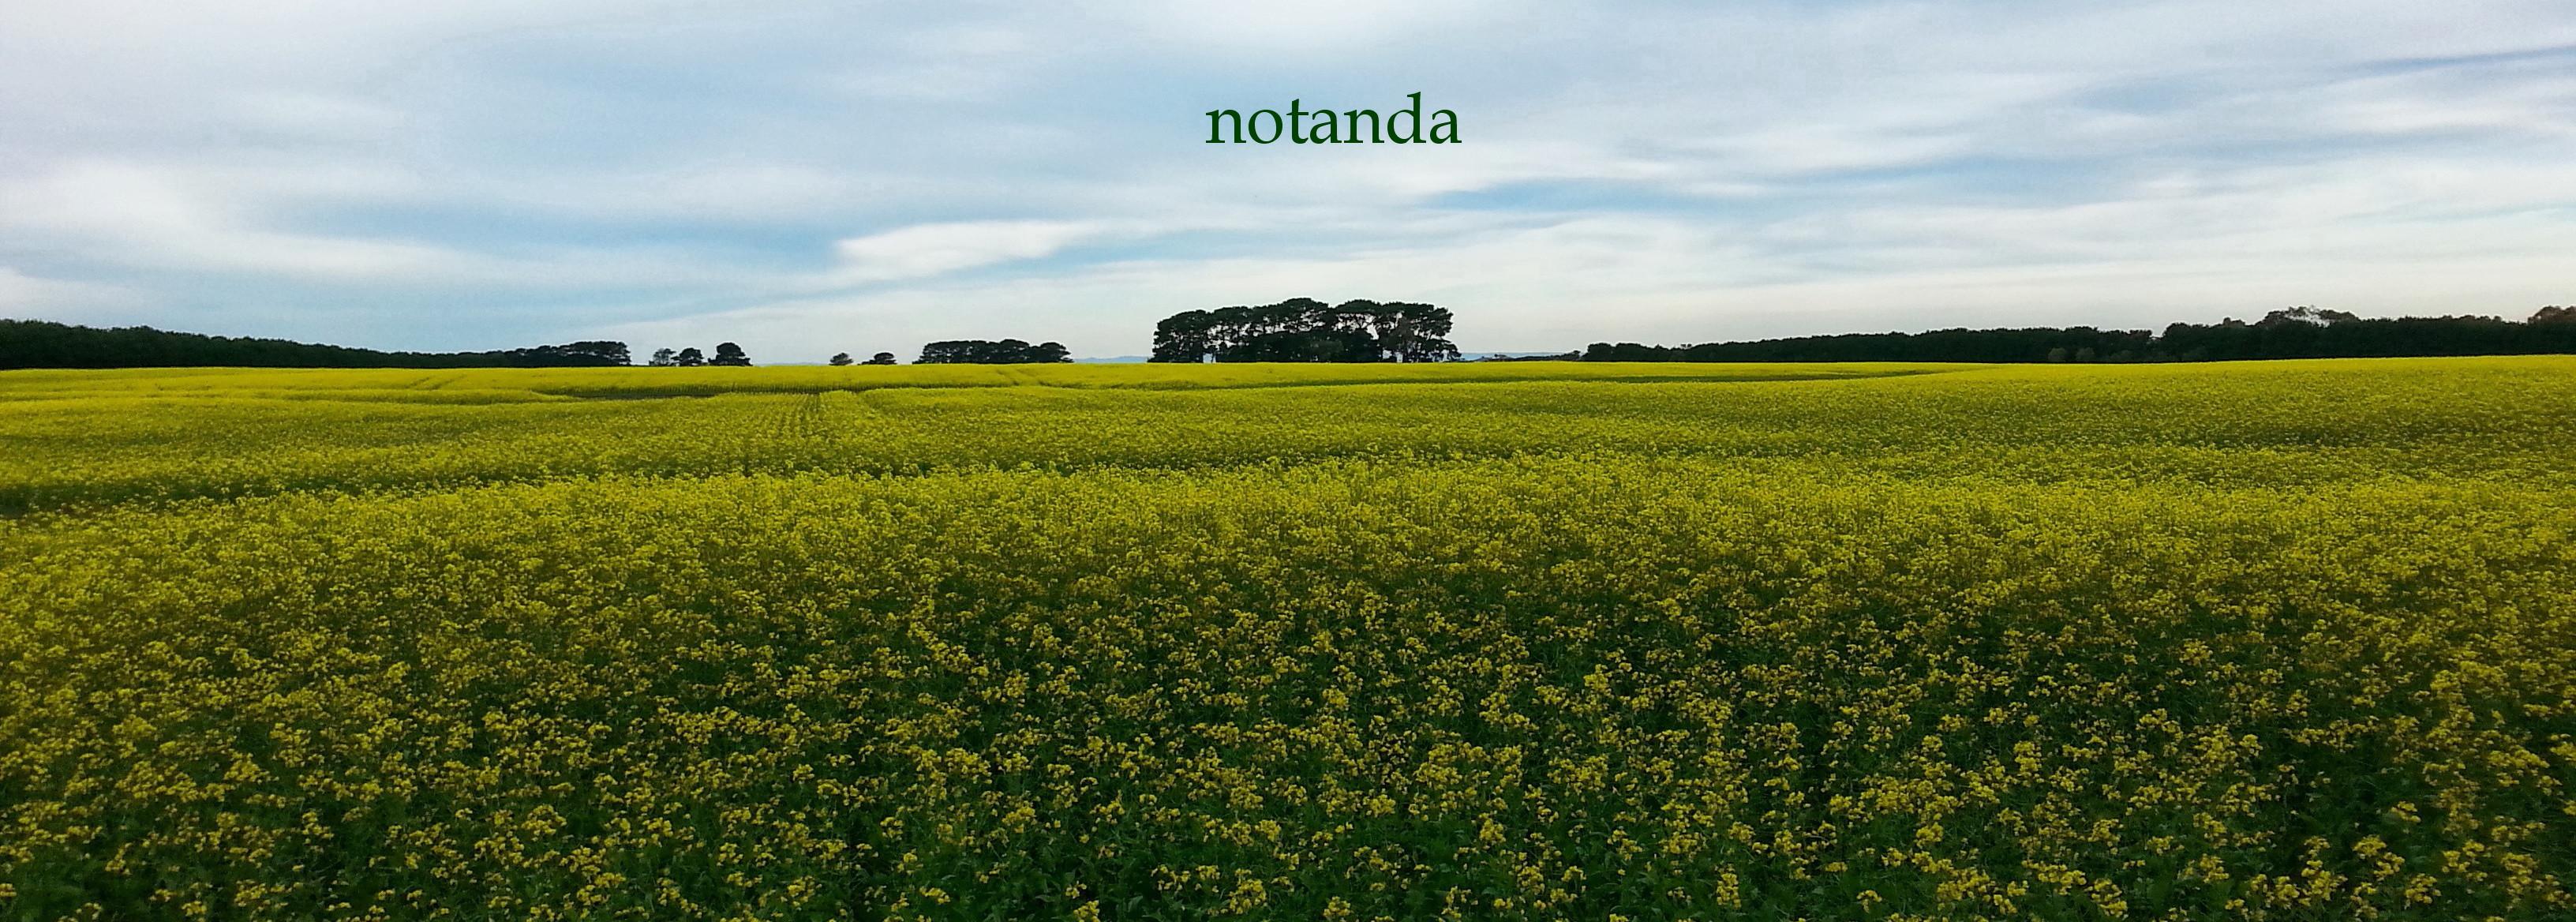 Notanda